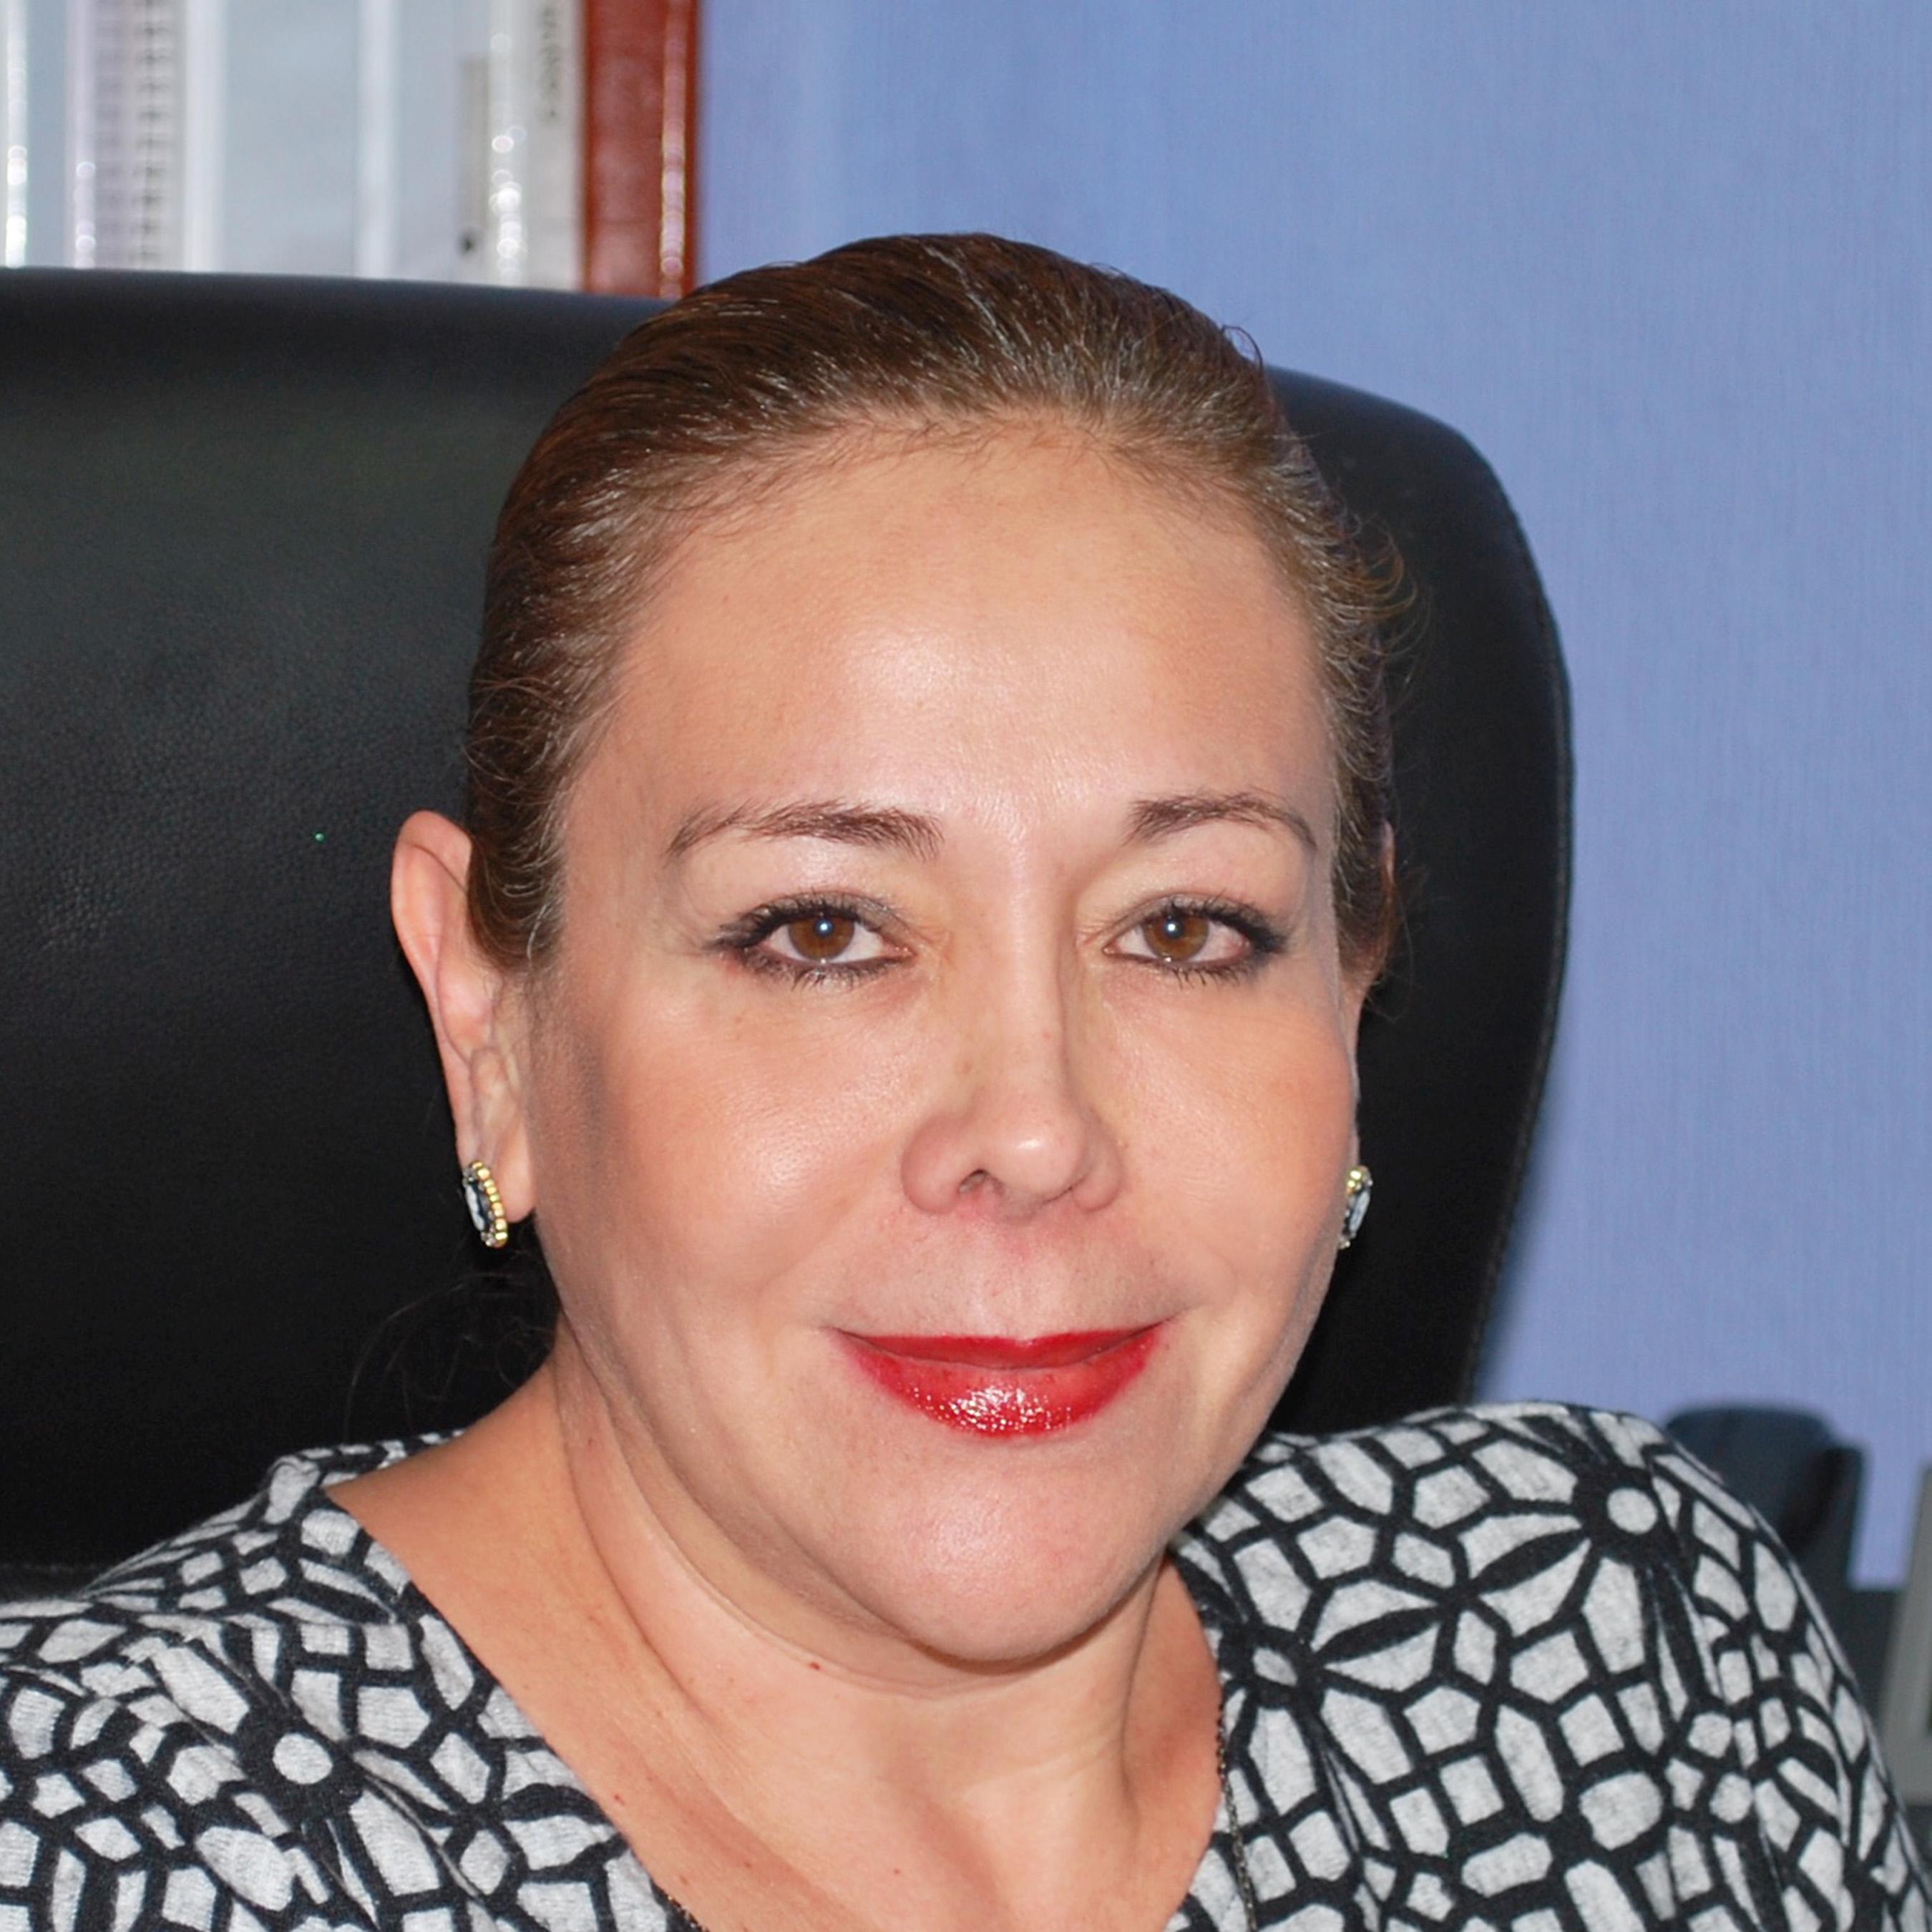 Dra. Nazarea Herrera Maldonado